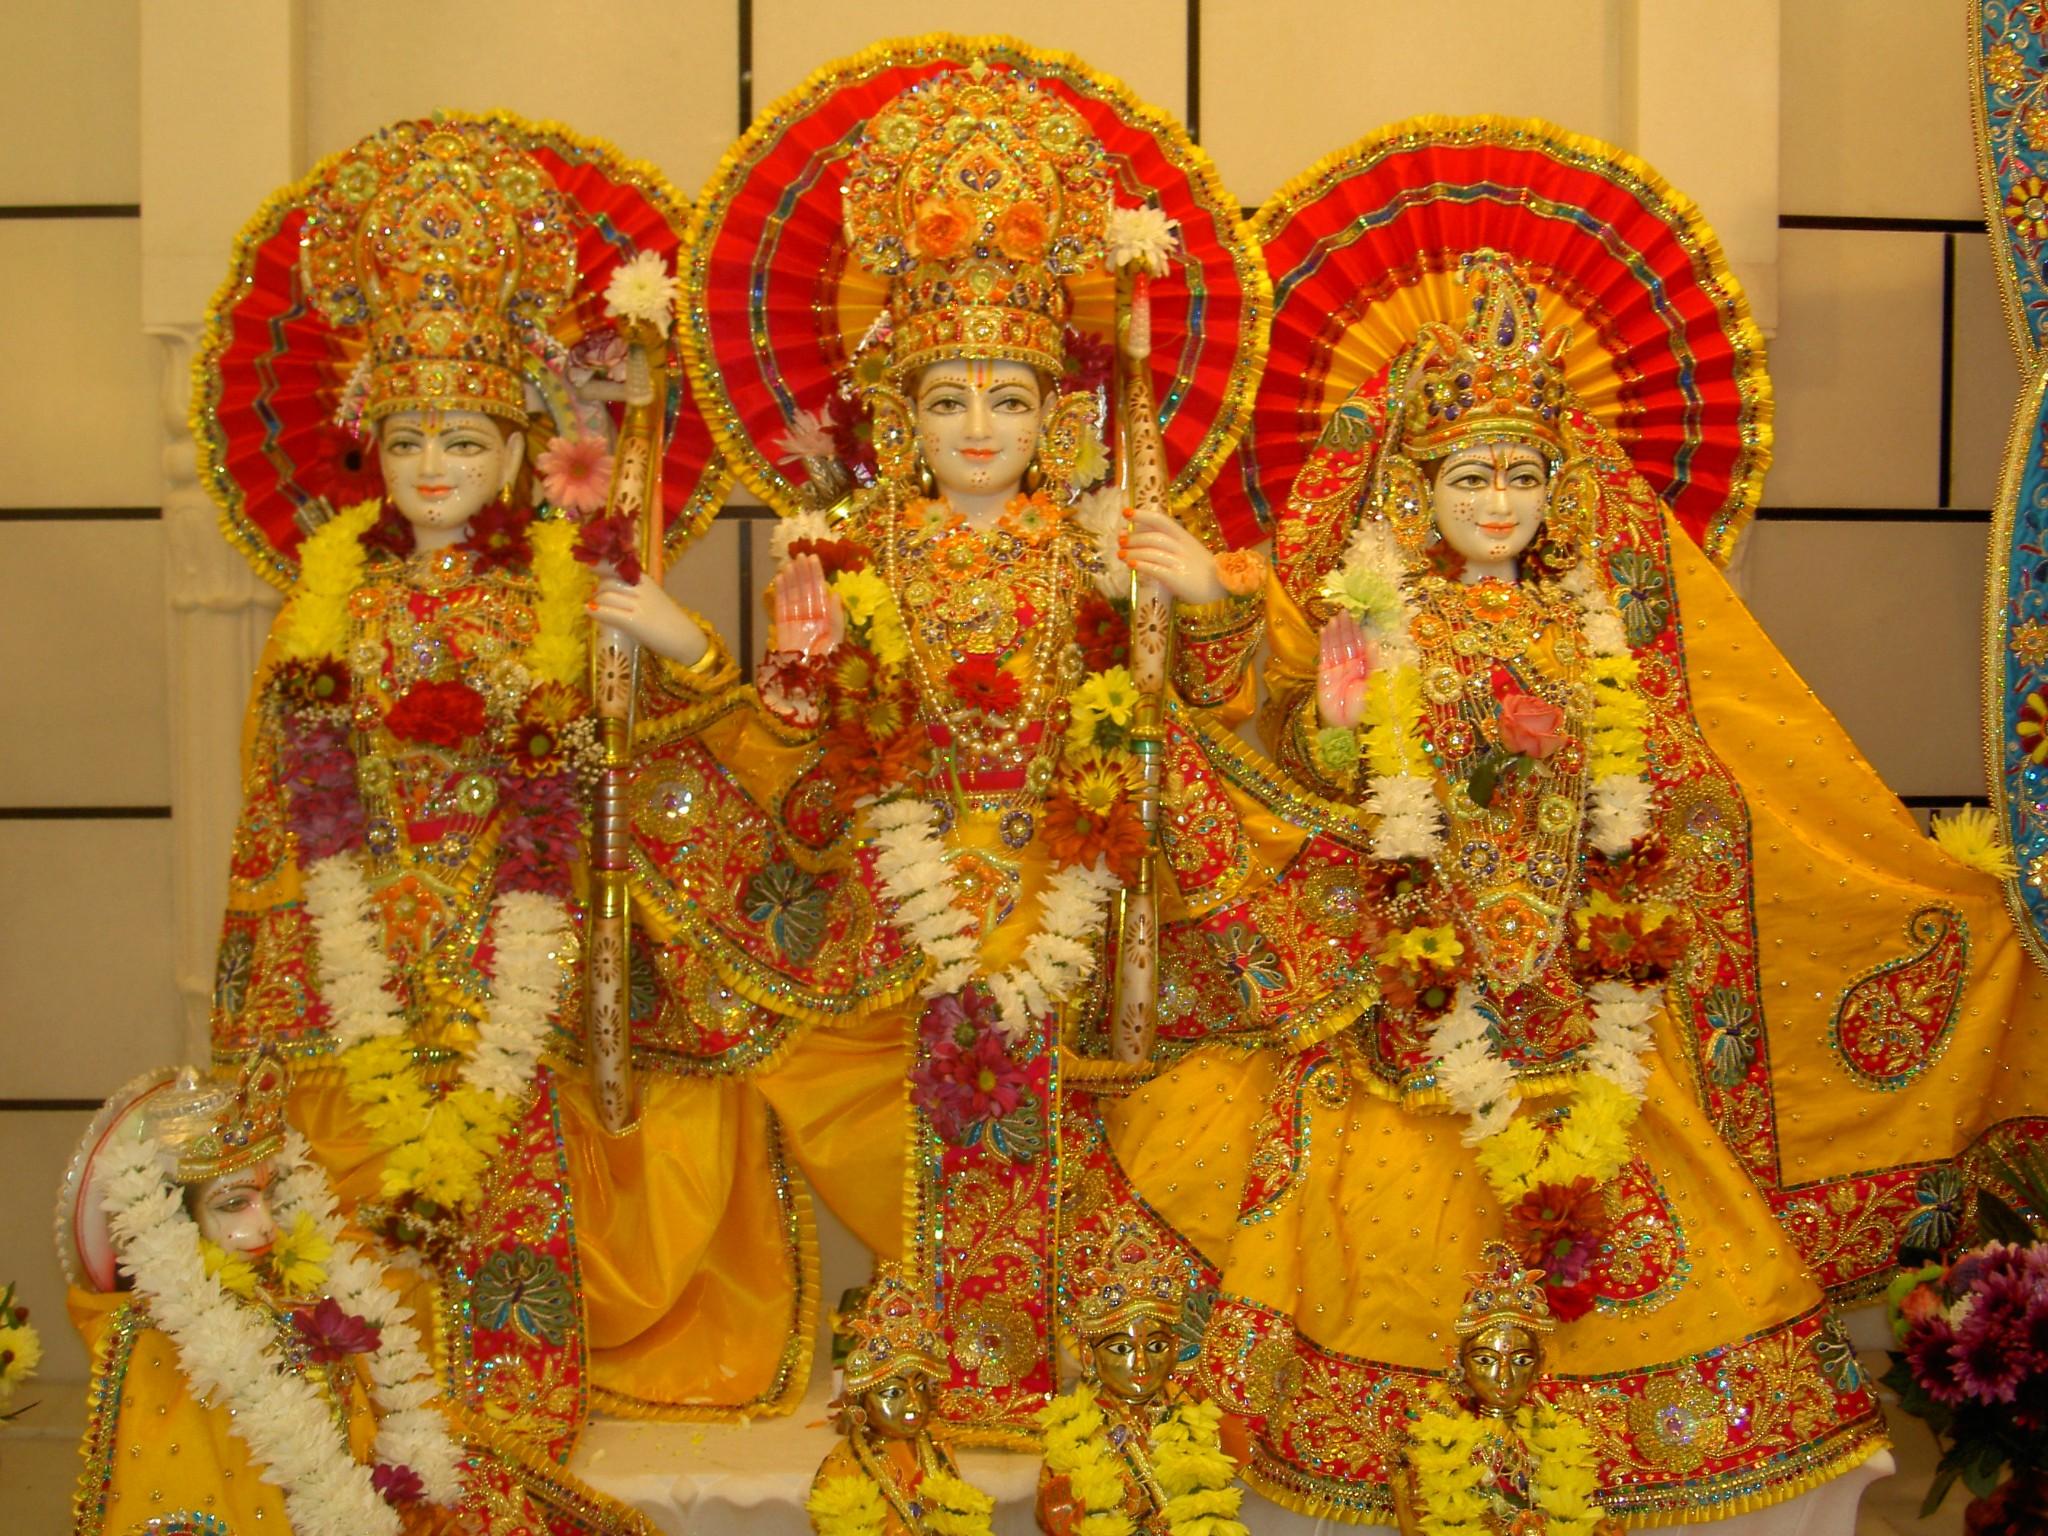 http://2.bp.blogspot.com/-1blJ9ojMhoY/UWo6DPYxJhI/AAAAAAAAQsw/sUsAuPiRPv0/s2500/Hindu+God+Ram+Wallpaper+and+Pictures+-+19.jpg